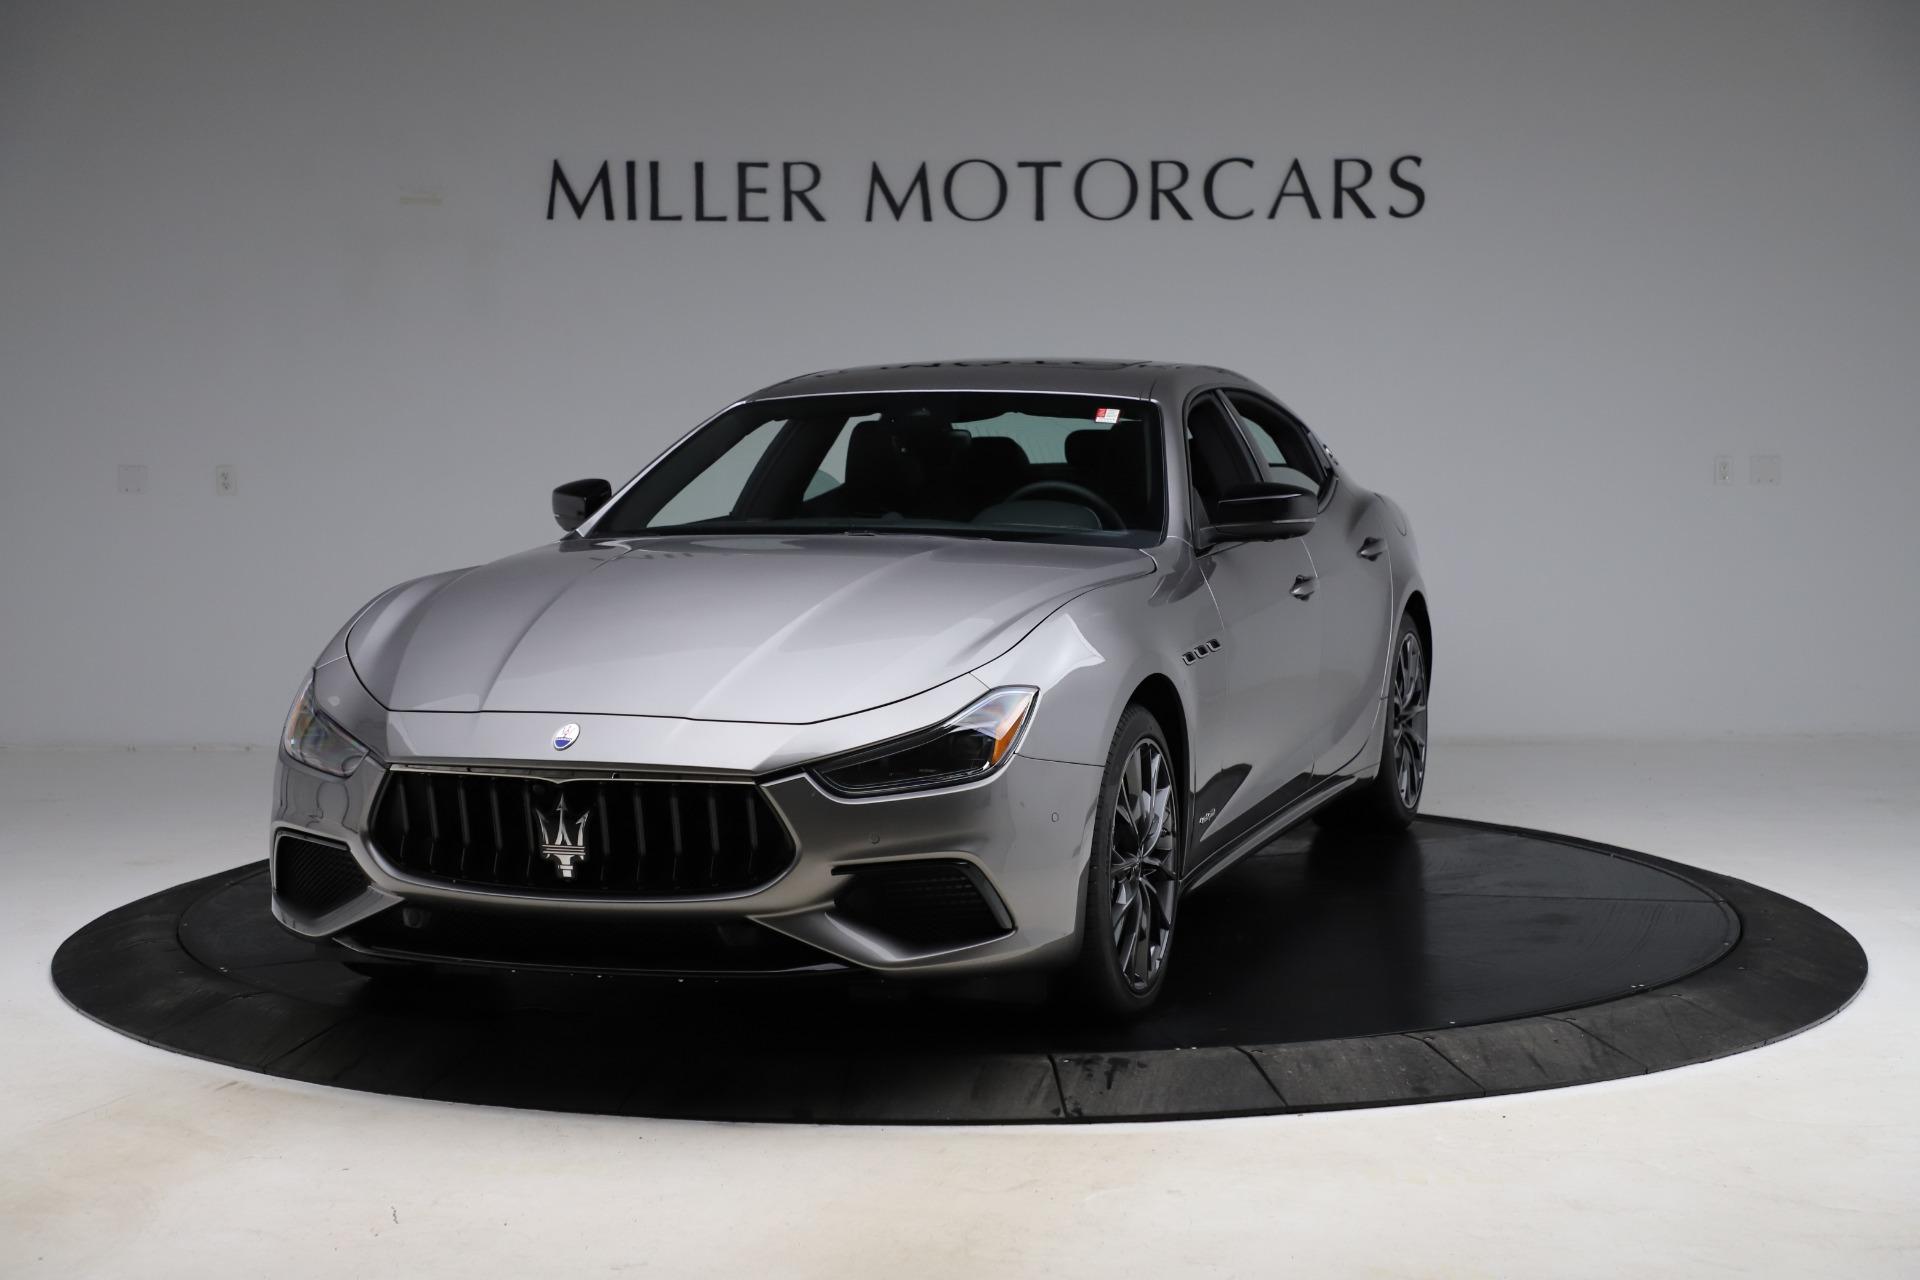 New 2021 Maserati Ghibli S Q4 GranSport for sale $98,125 at Aston Martin of Greenwich in Greenwich CT 06830 1